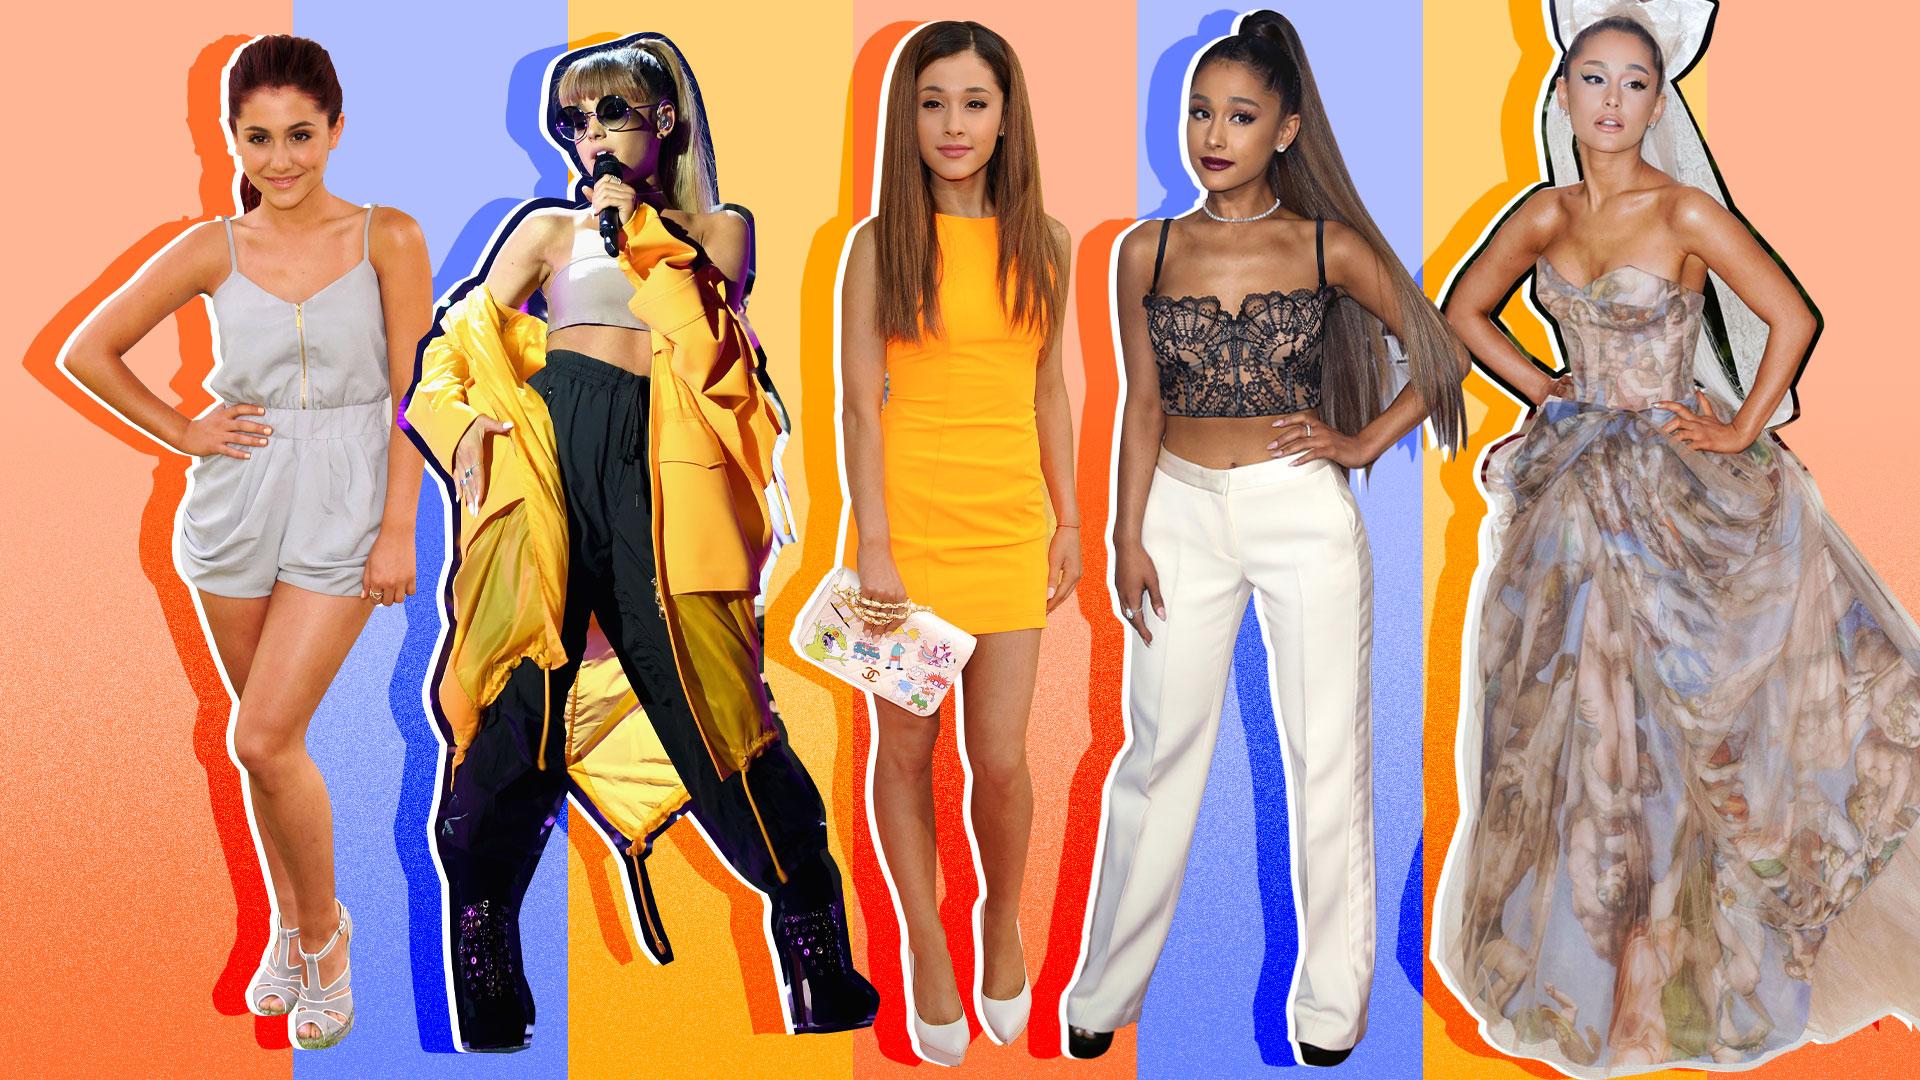 Ariana Grande's Fashion Evolution, from Nickelodeon Star to Pop Princess